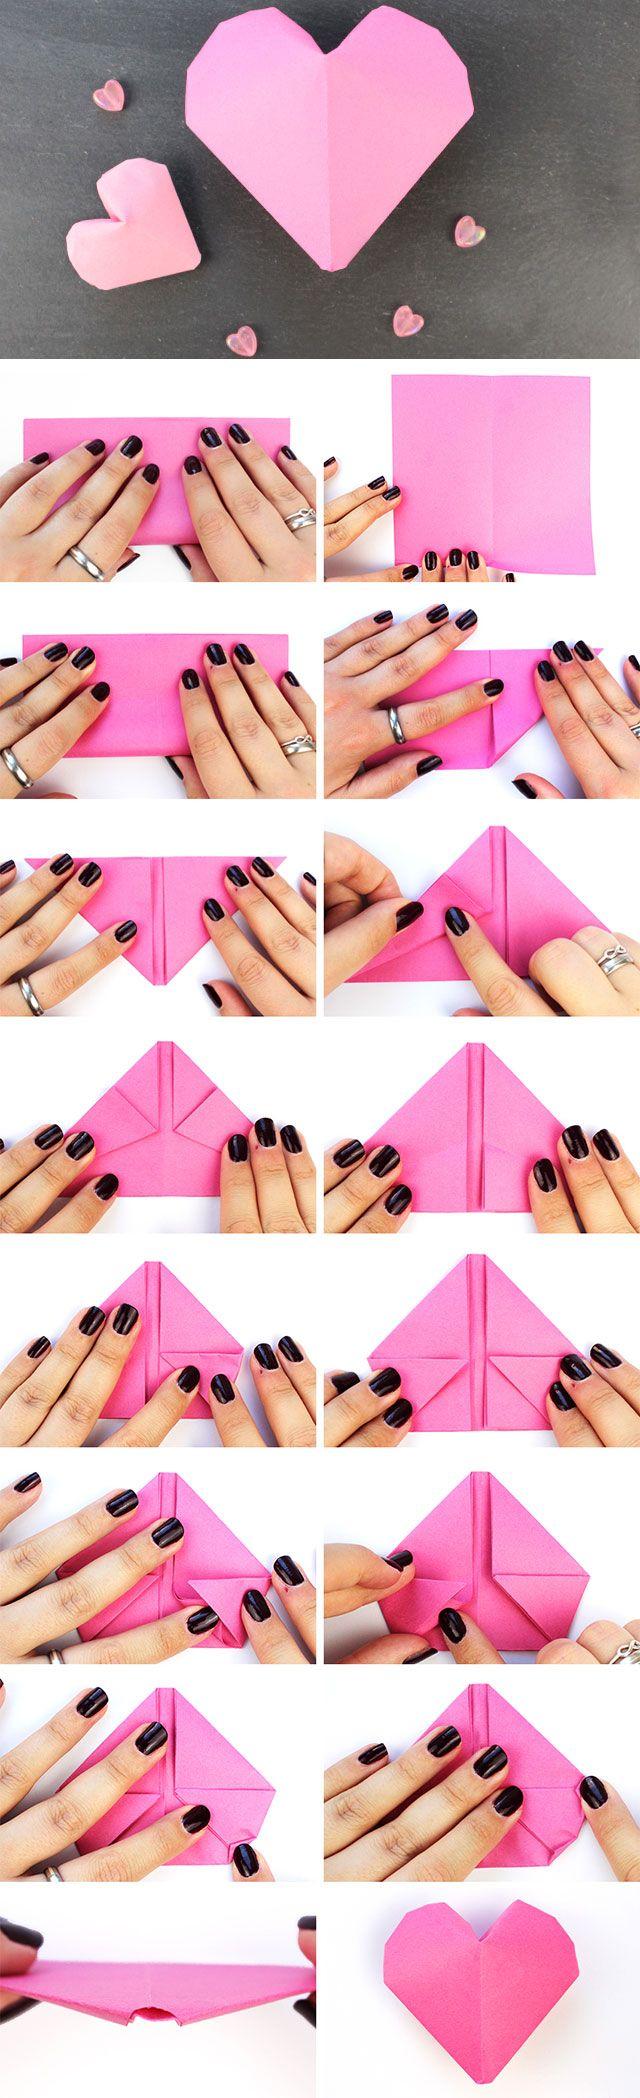 3d Origami Herz Faltanleitung Origami Falten Anleitung Papier